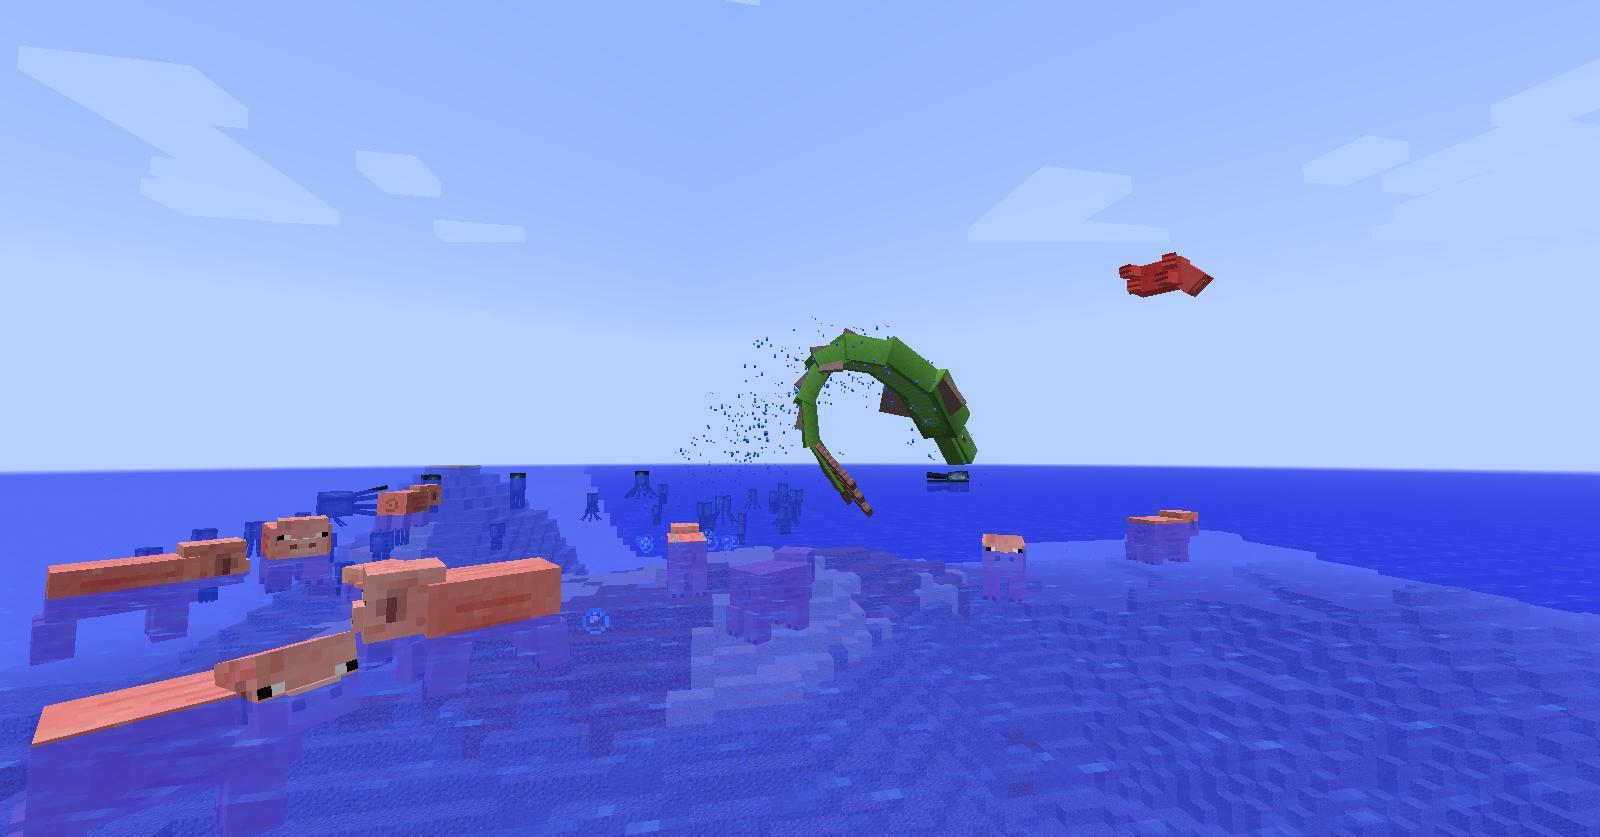 minecraft mod aquatic abyss ocean creatures mods sea monster mythical serpent serpents curseforge mobs oceans fish apk java v1 mc